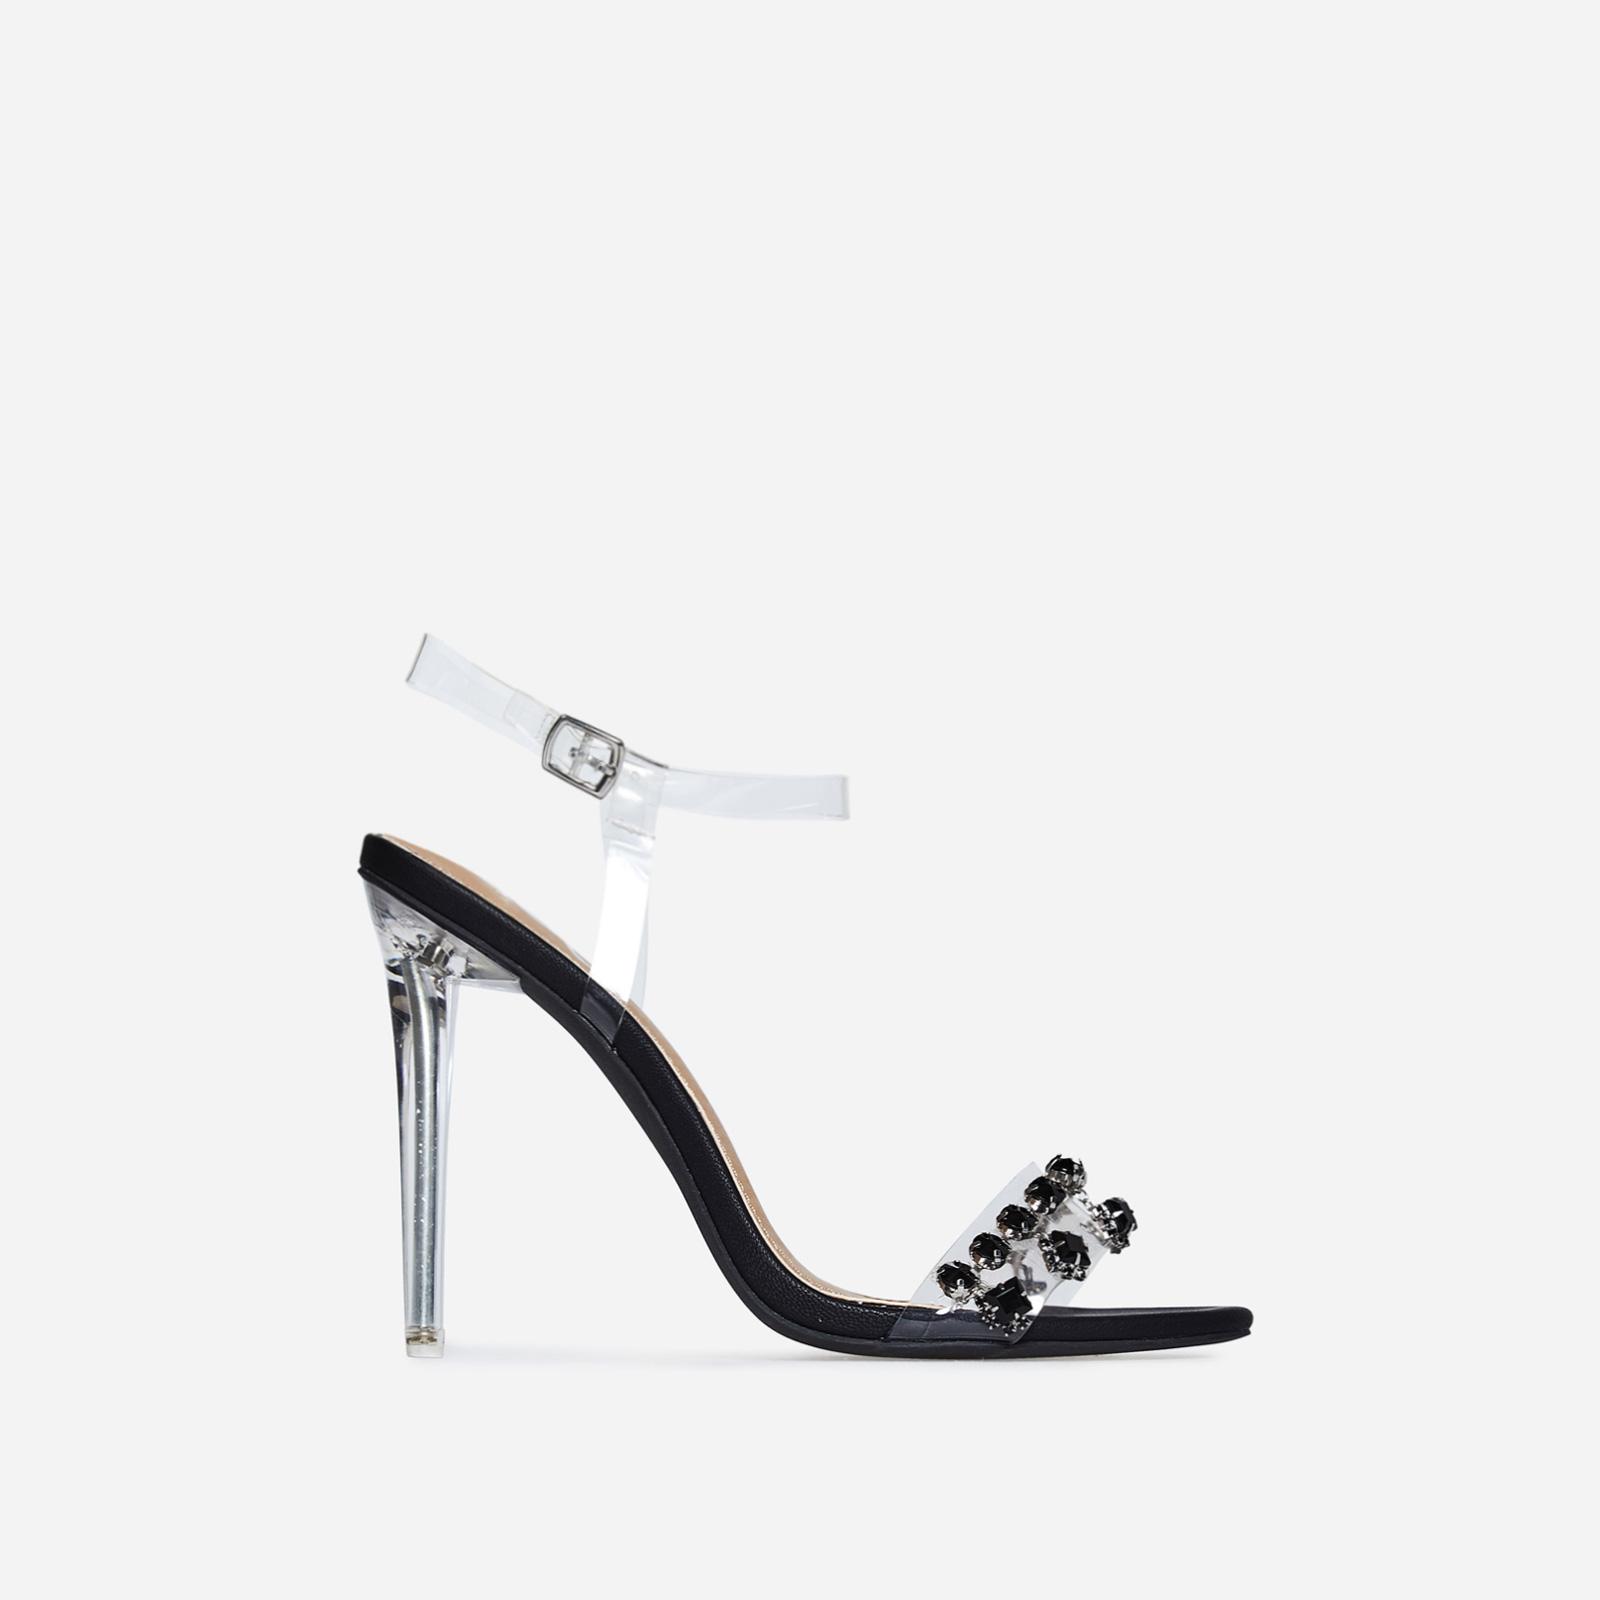 Peyton Jewel Embellished Perspex Heel In Black Faux Leather